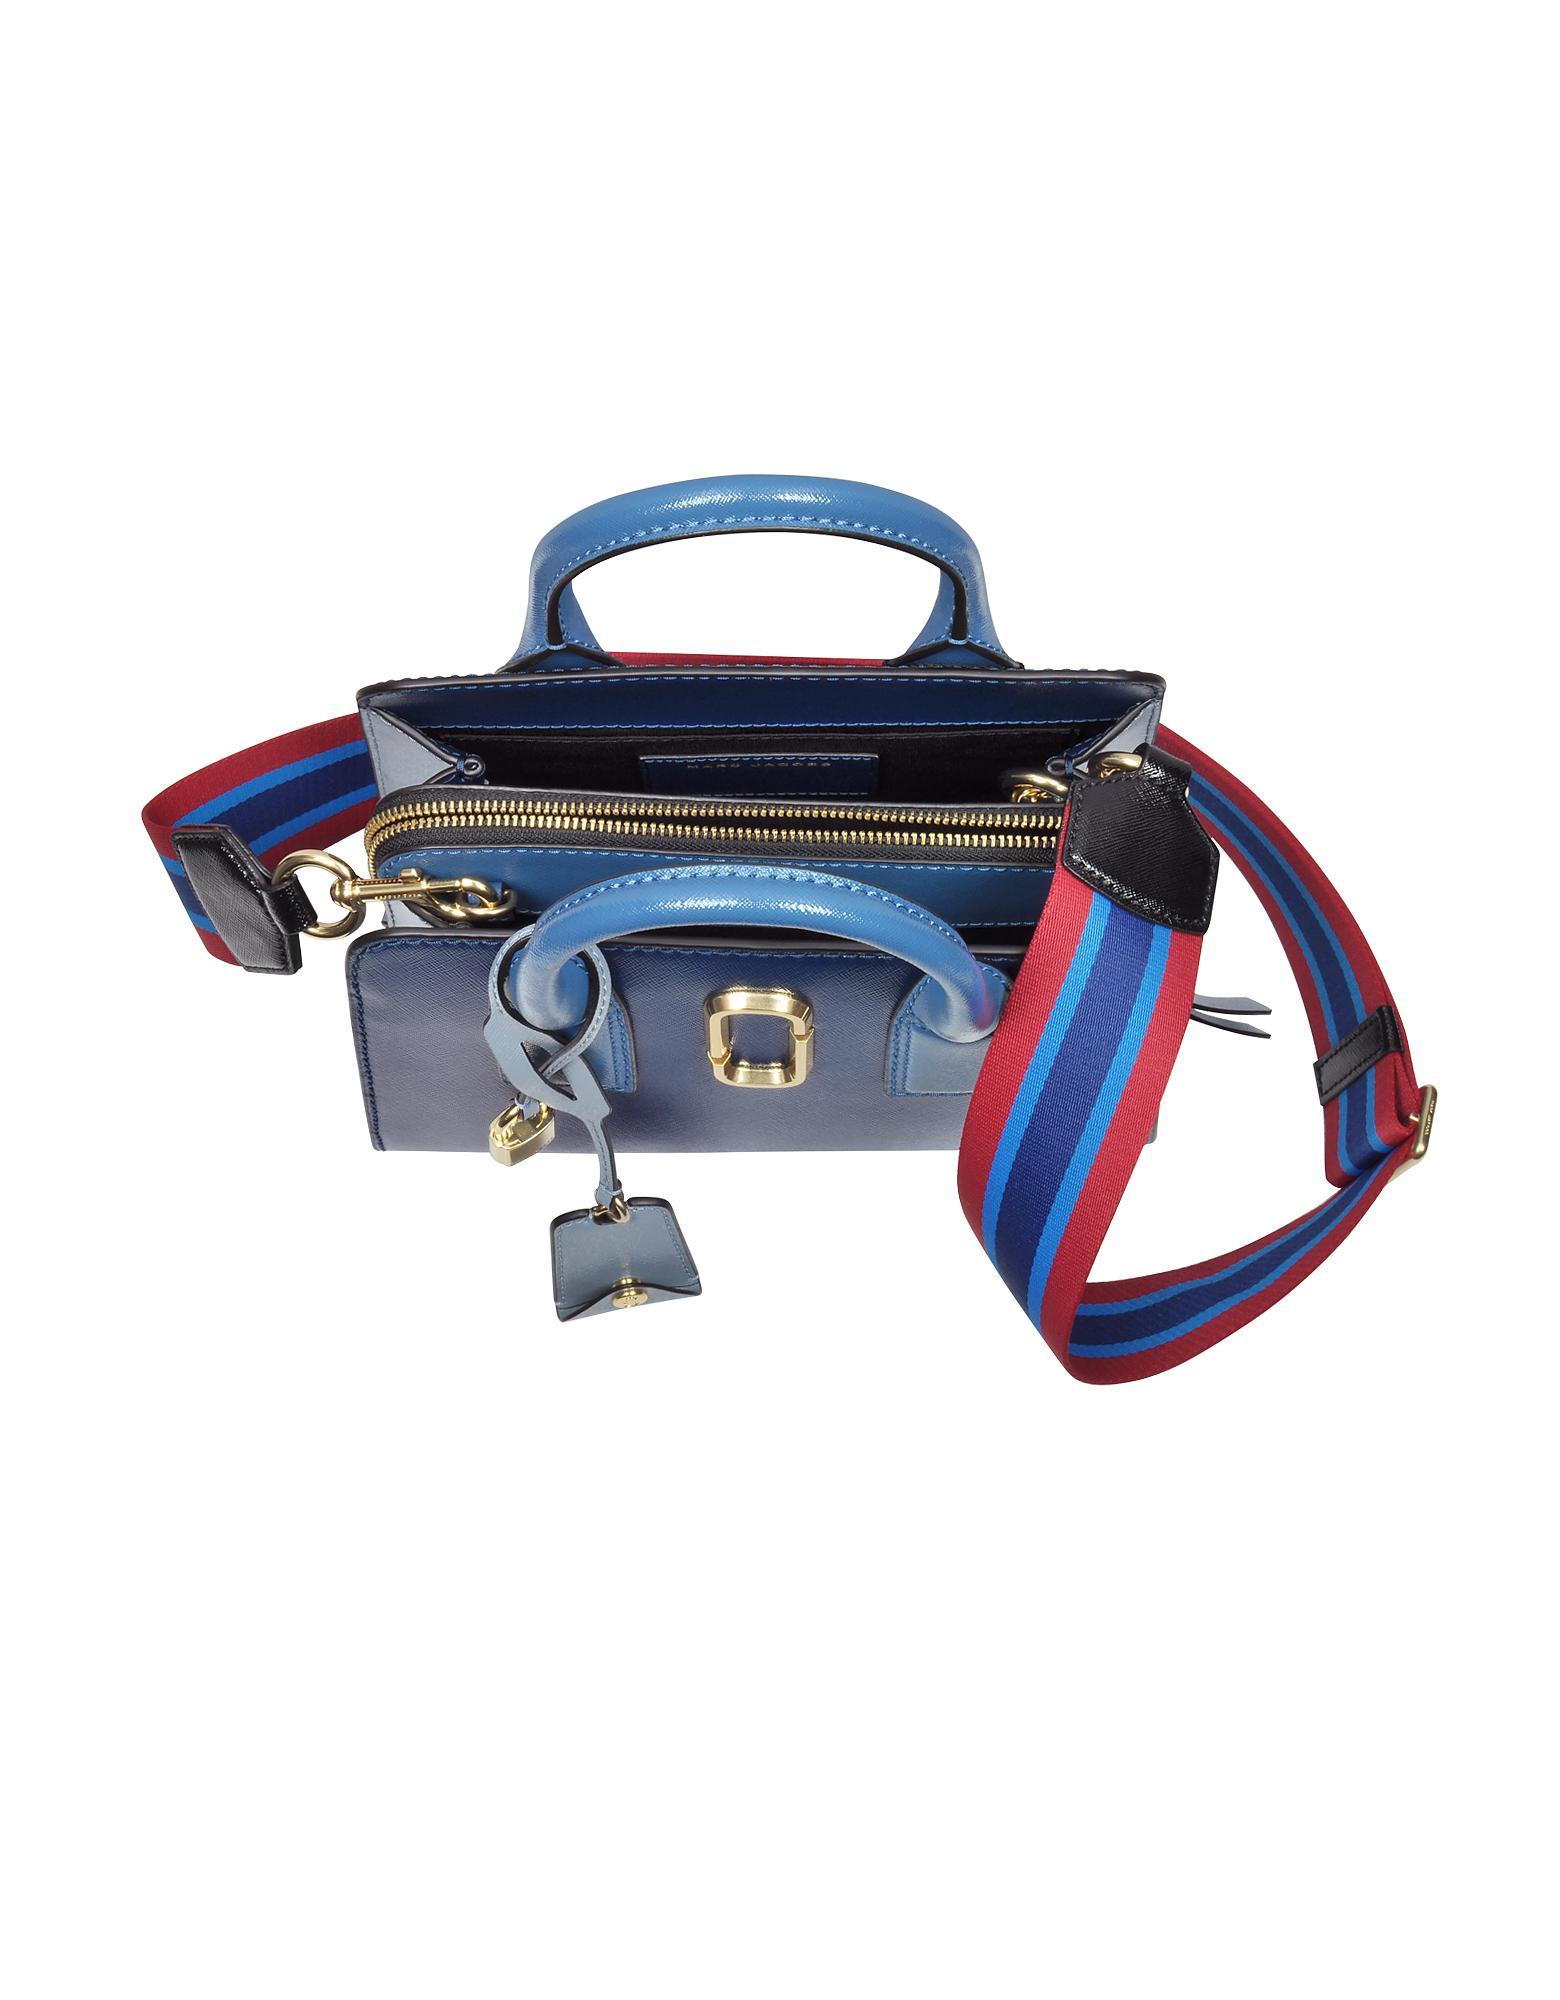 ad63a24b10 Marc Jacobs Blue Sea Multi Little Big Shot Tote Bag in Blue - Lyst